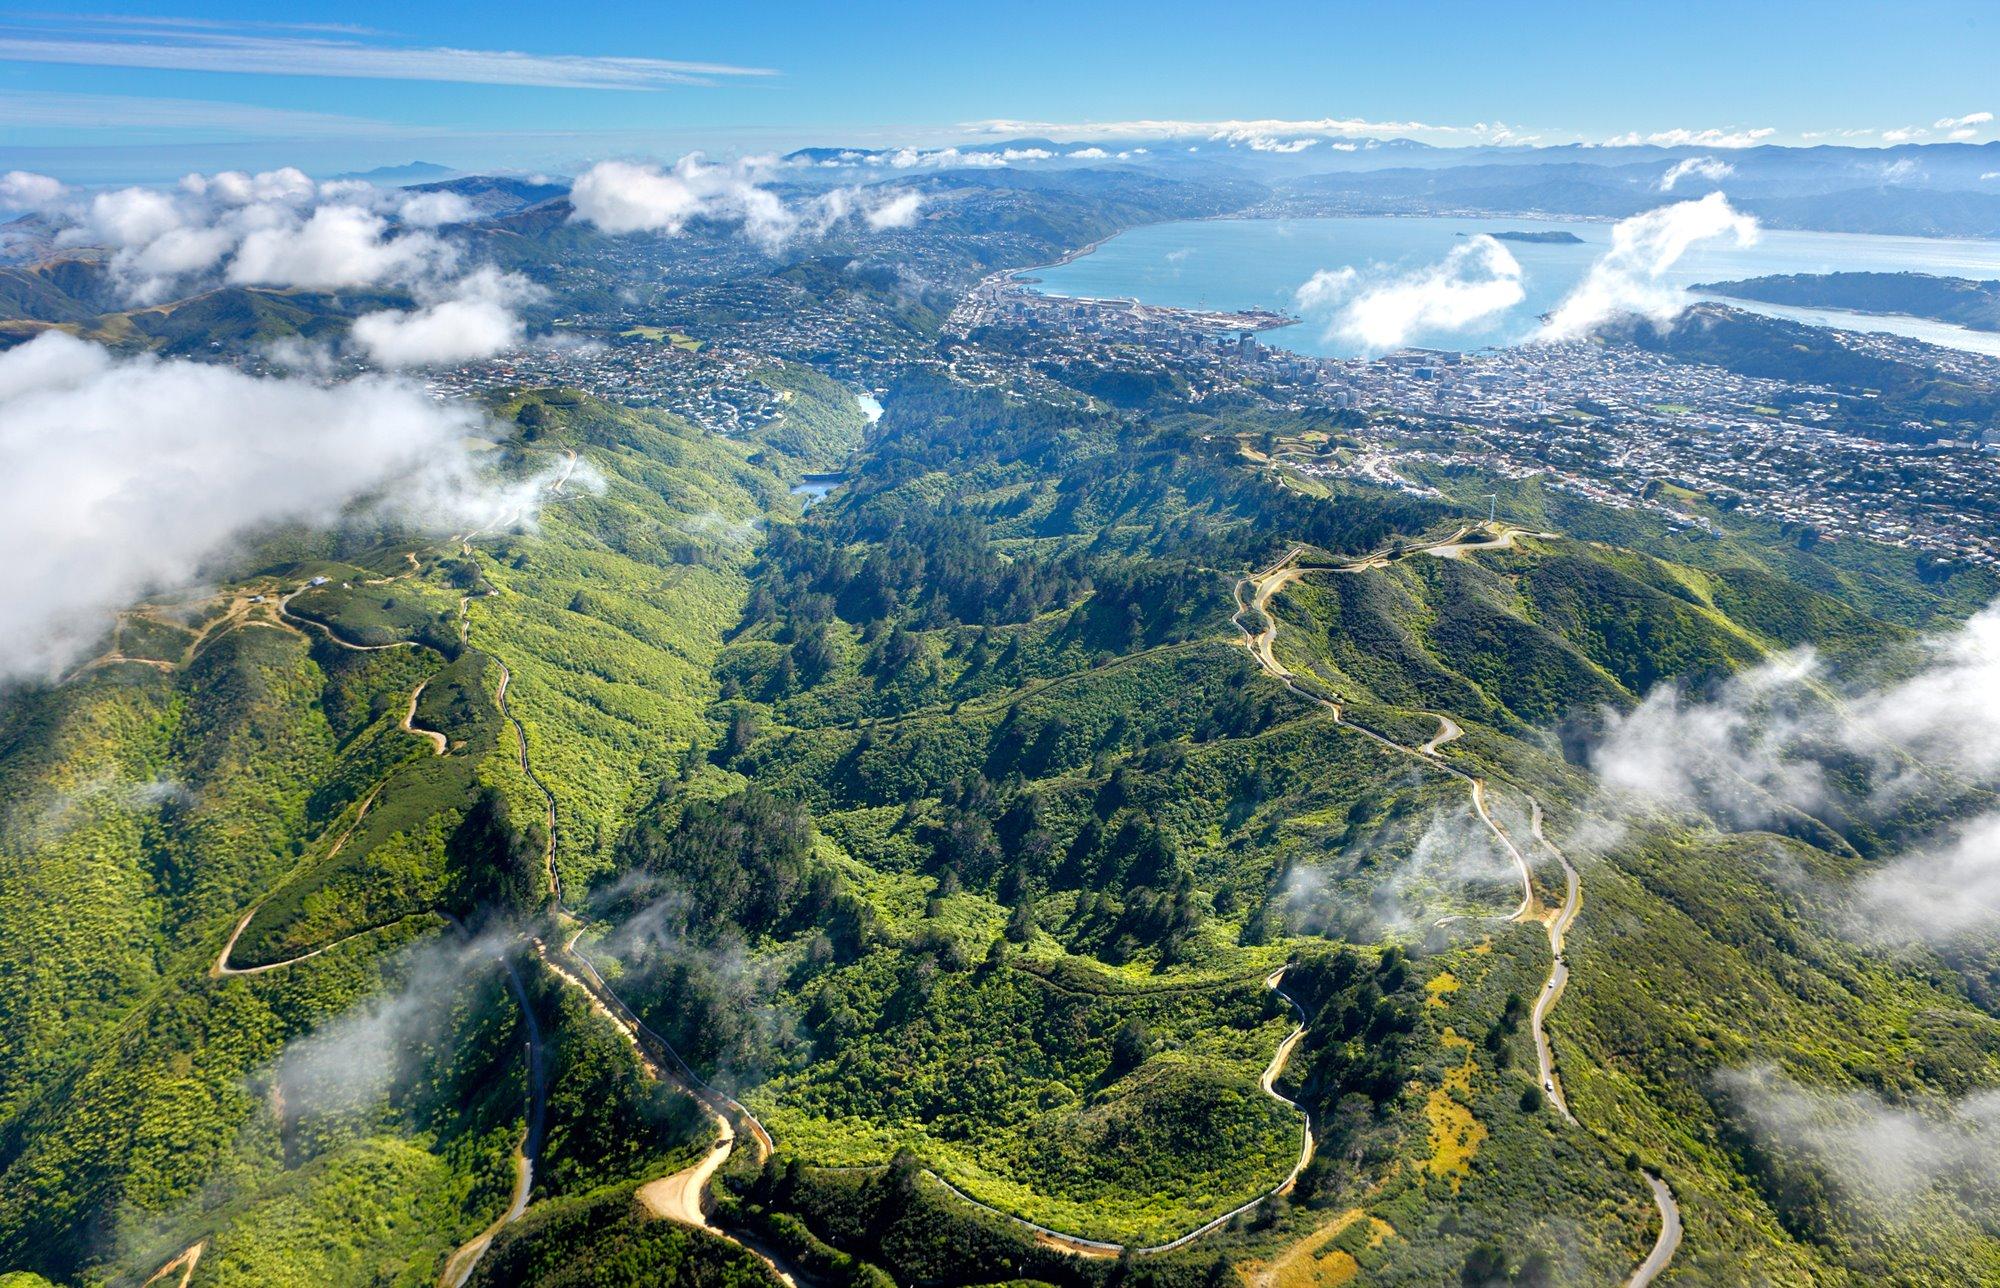 Arial view of Zealandia